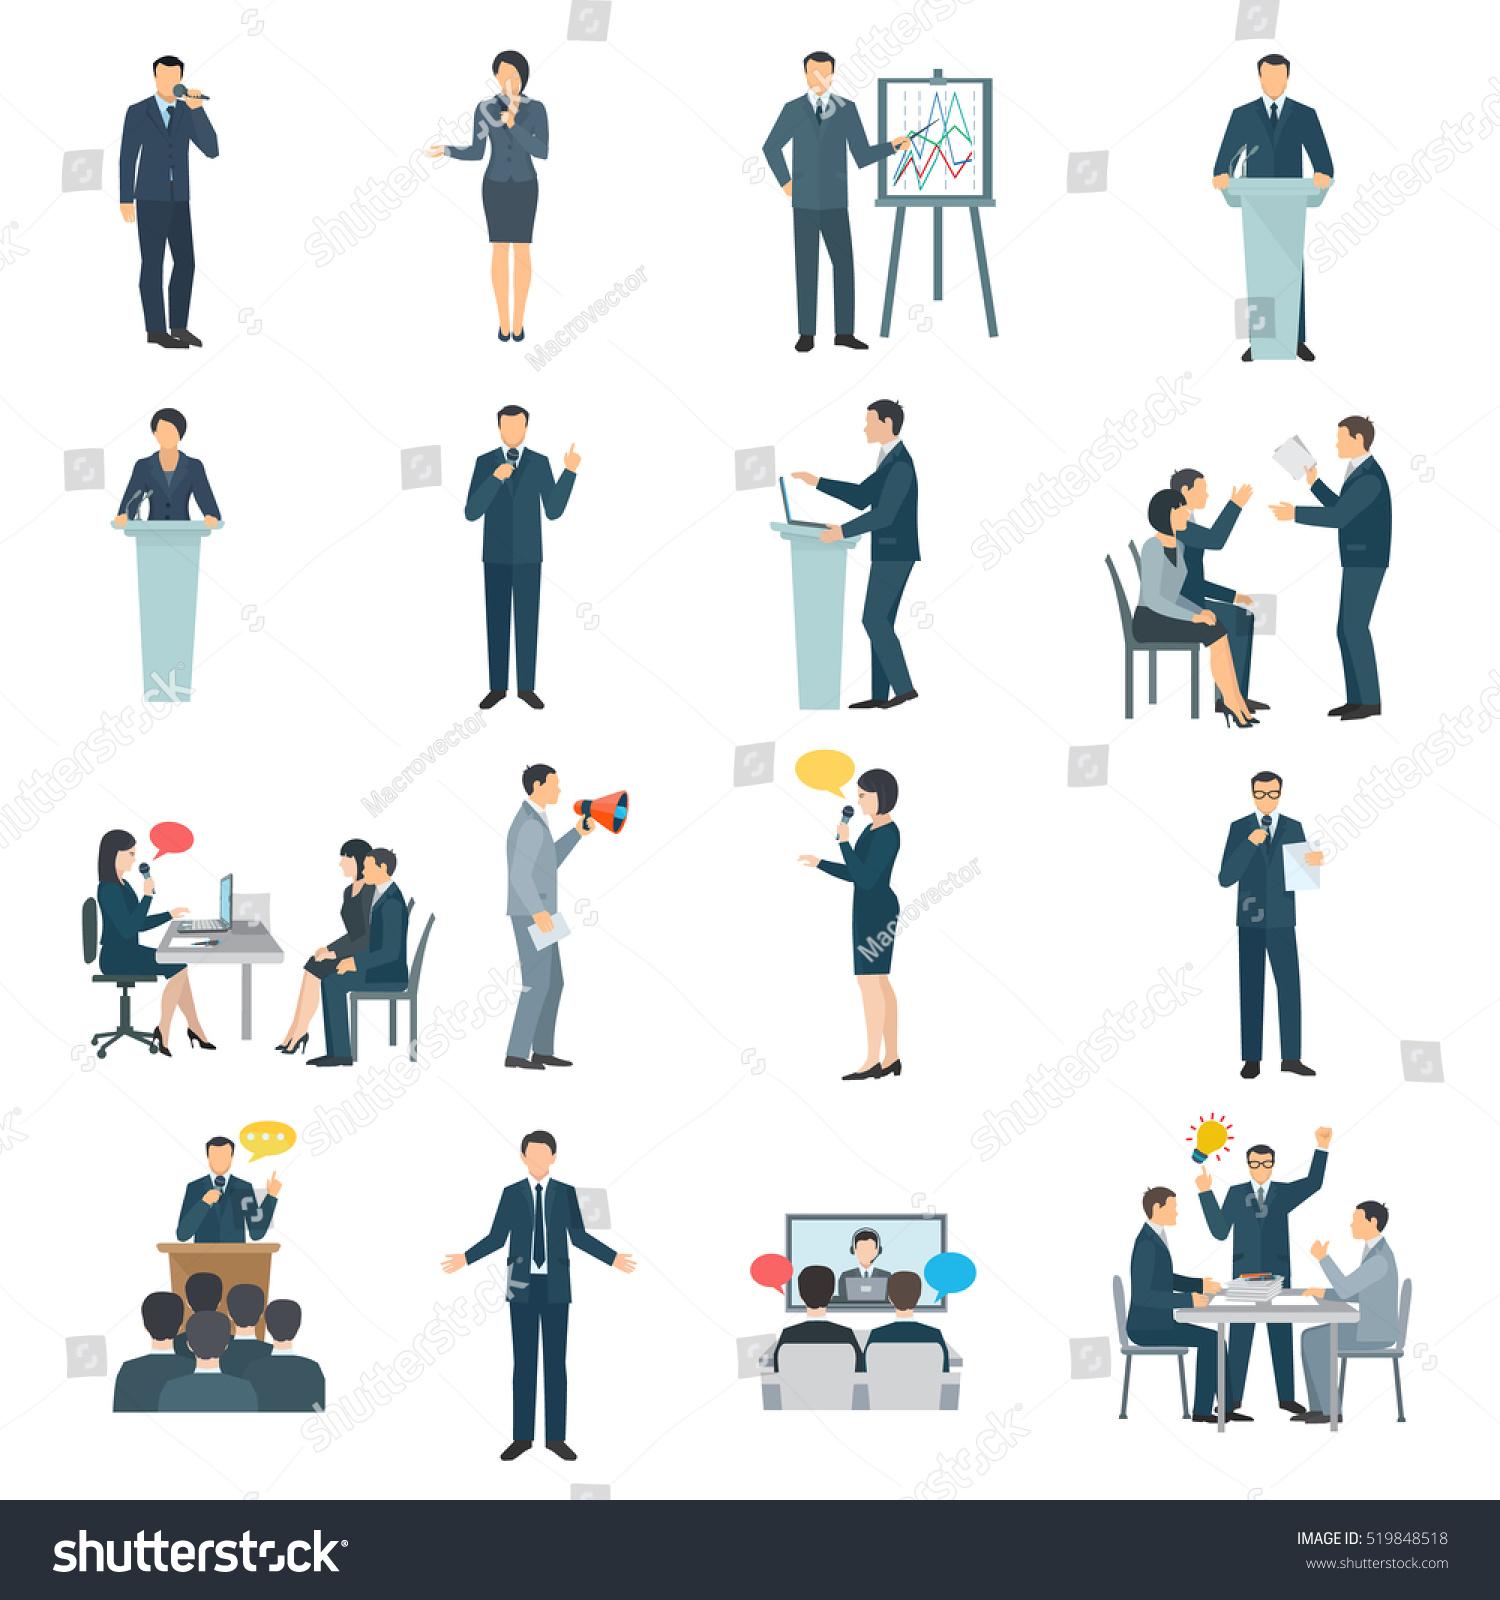 public speaking skills flat icons collection stock illustration 519848518